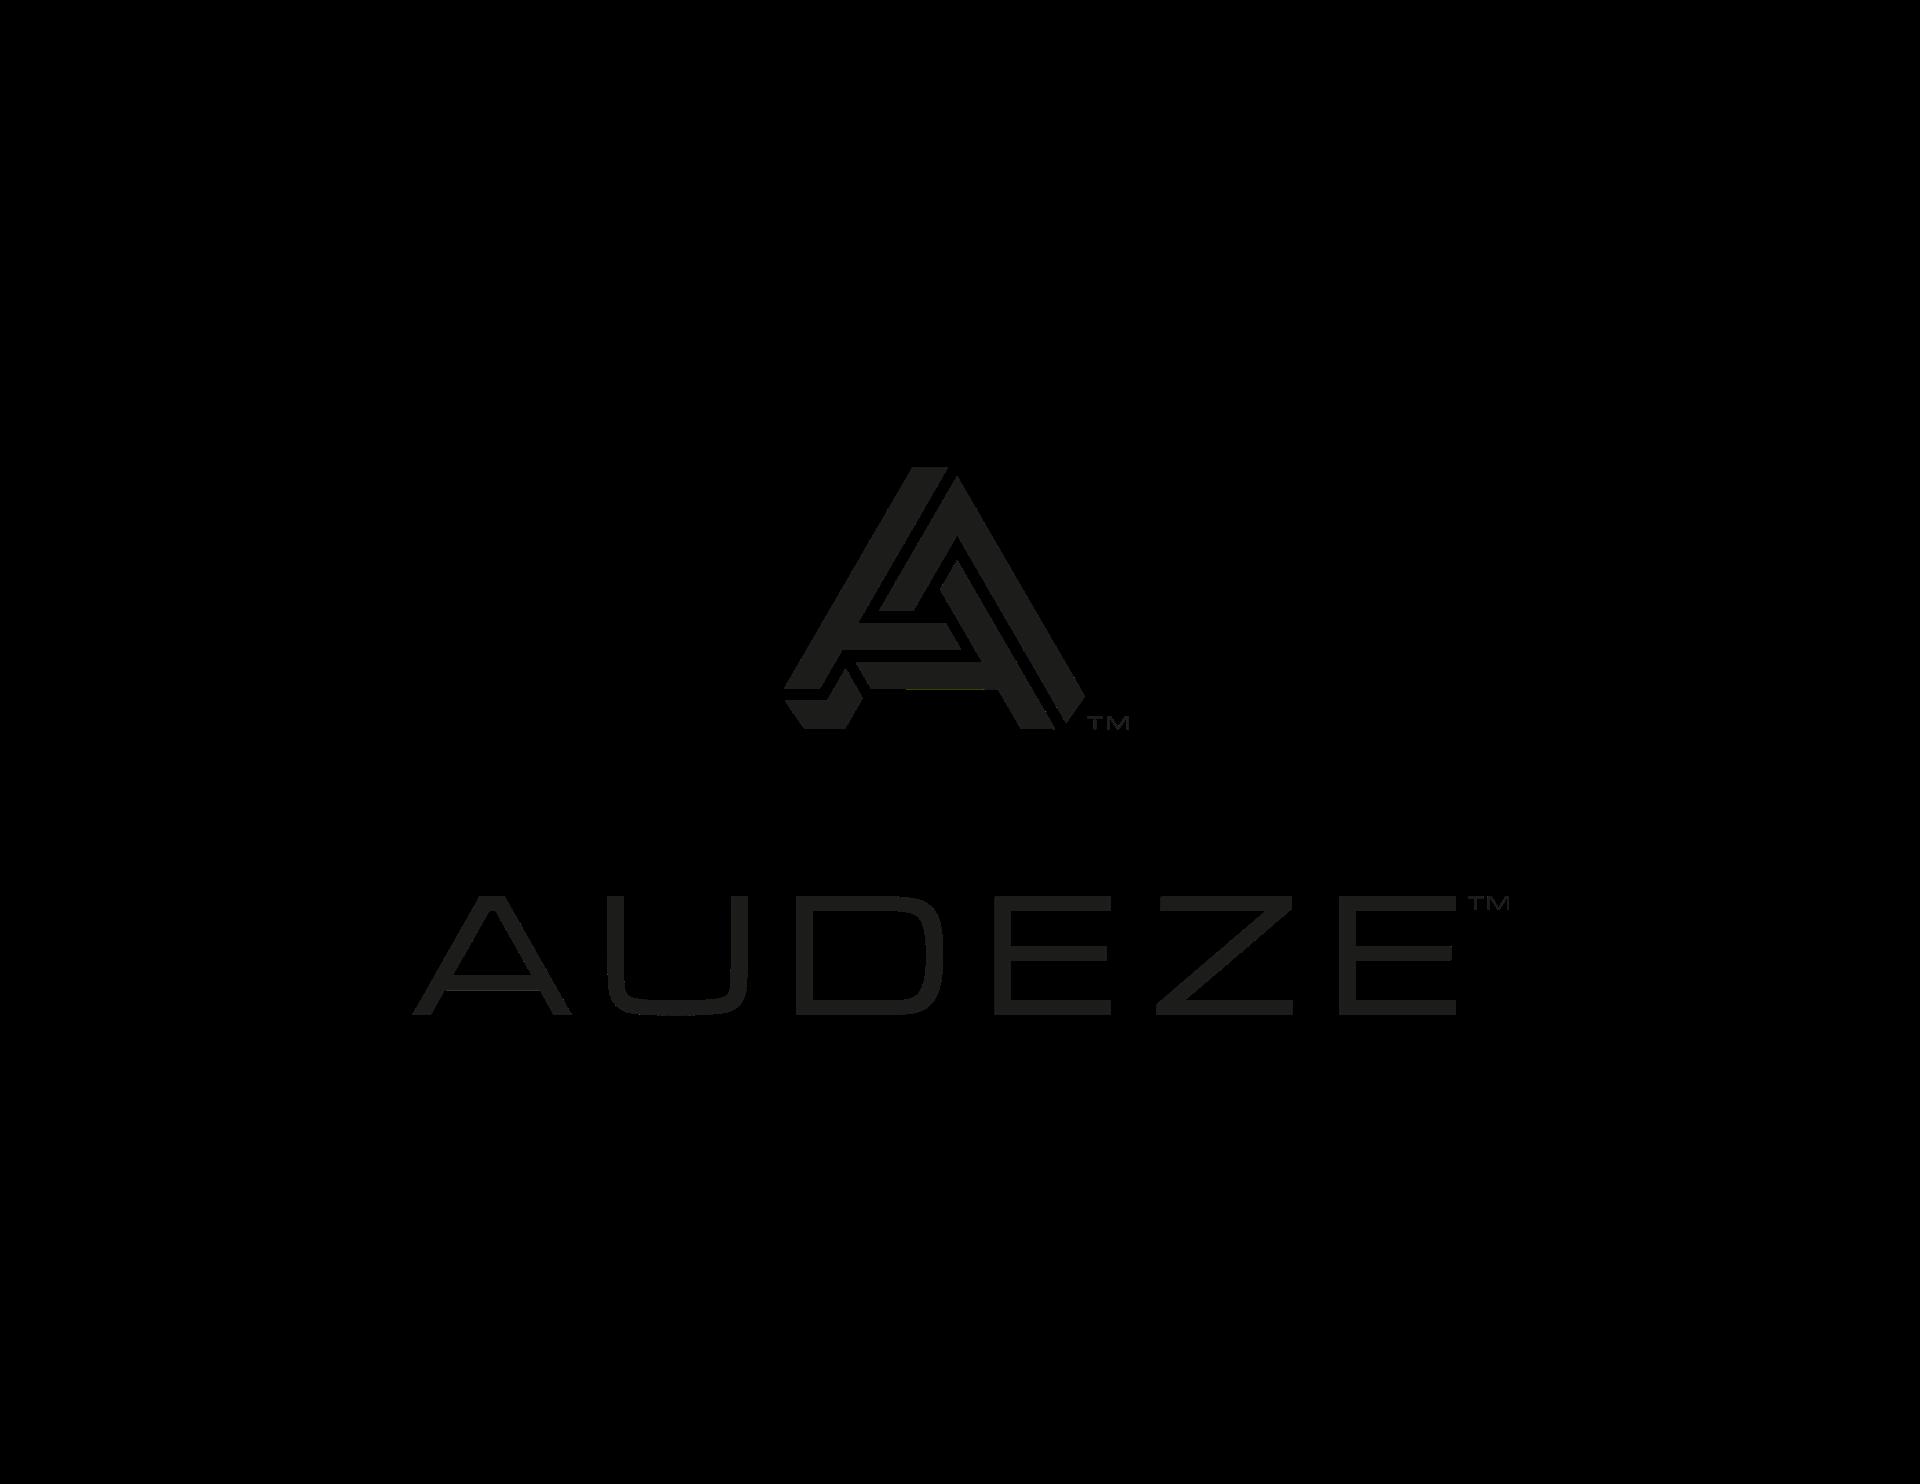 PhotoGallery_6185896_Audeze_Logo